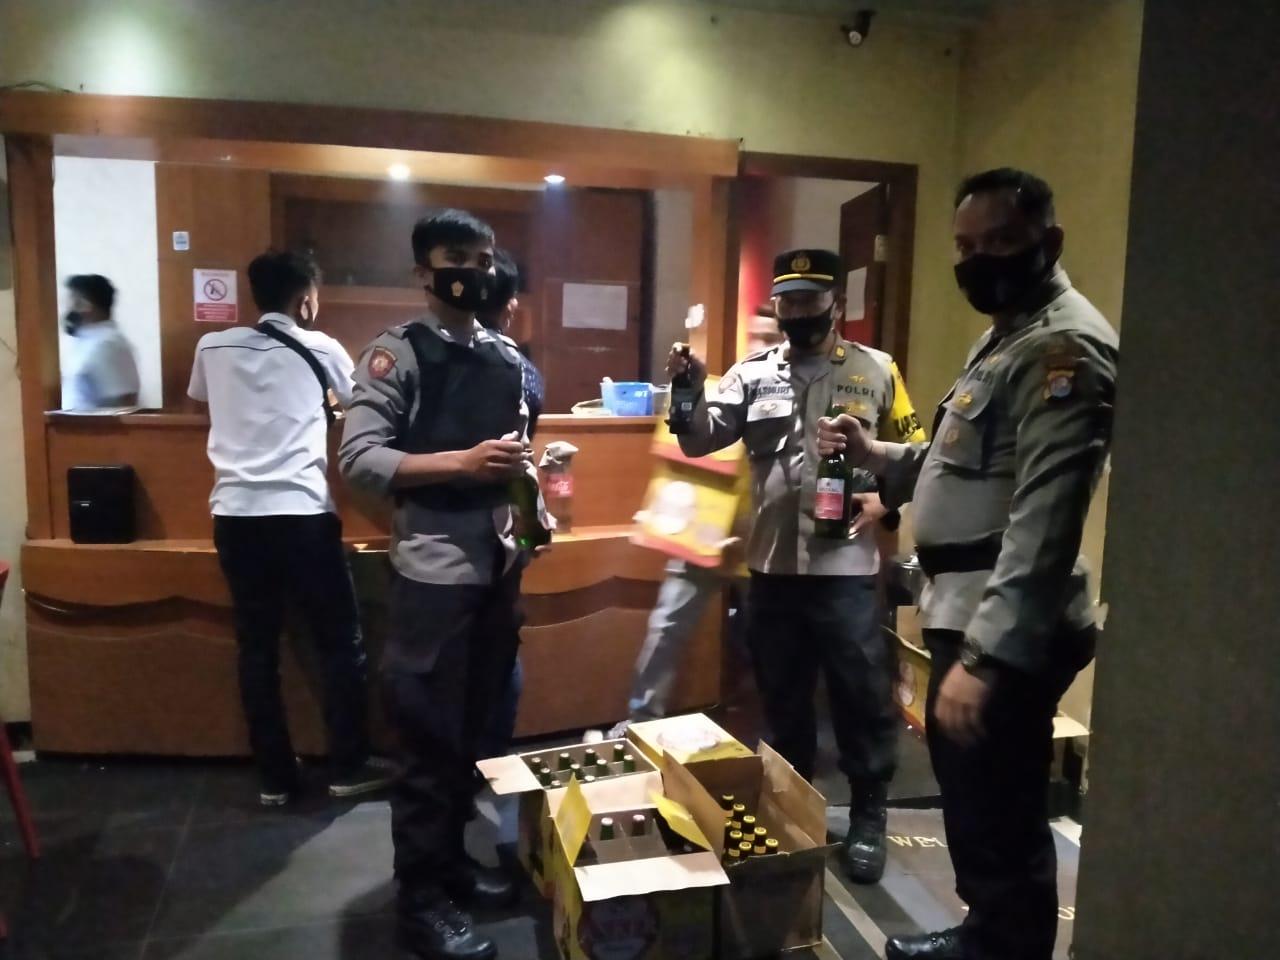 Gambar Polisi Amankan Puluhan Botol Miras Berbagai Merk di THM 1